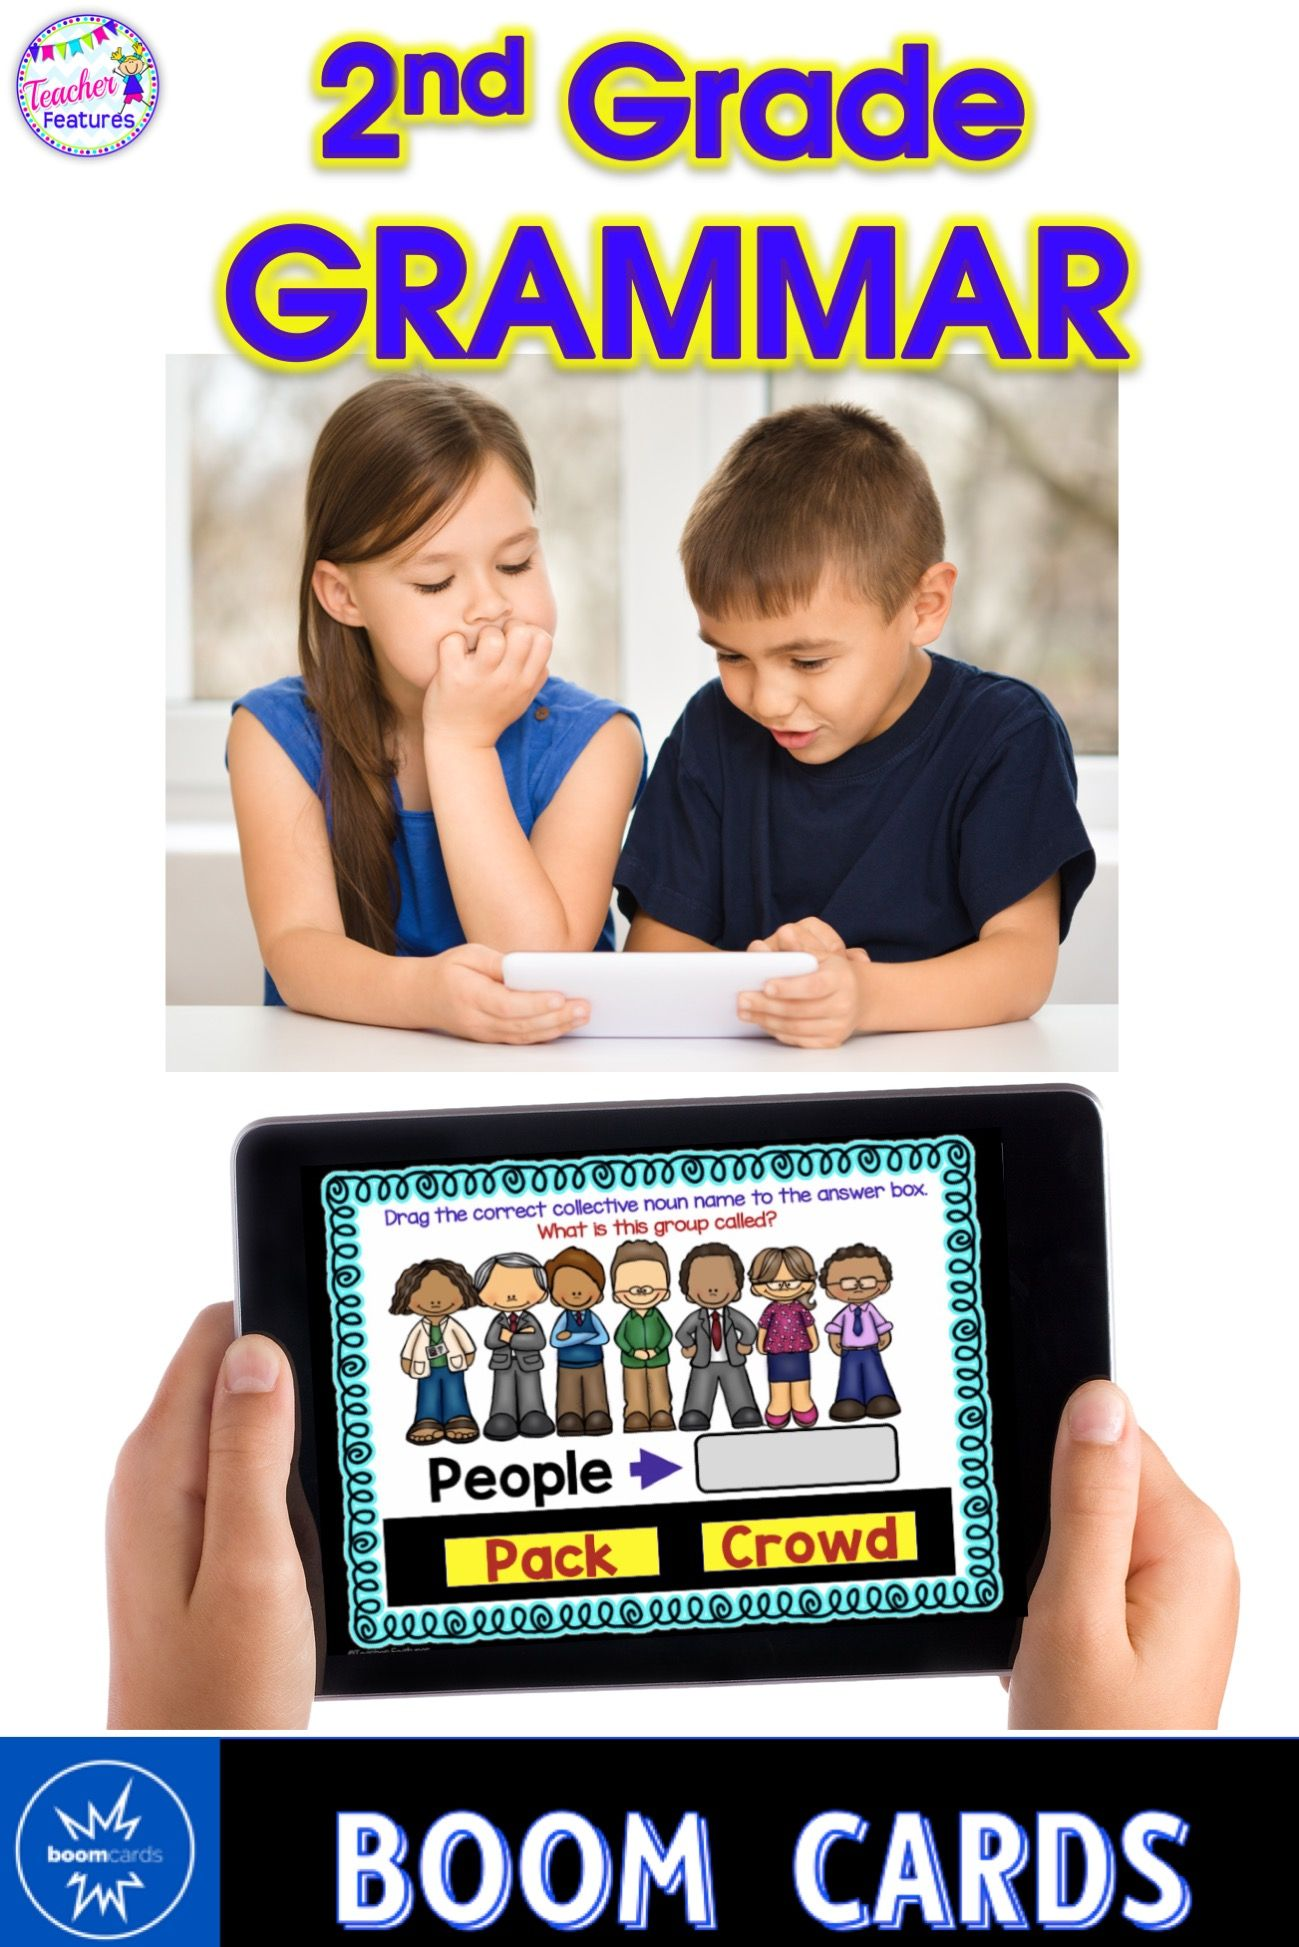 2nd Grade Boom Cards 2nd Grade Grammar Amp Reading Bundle